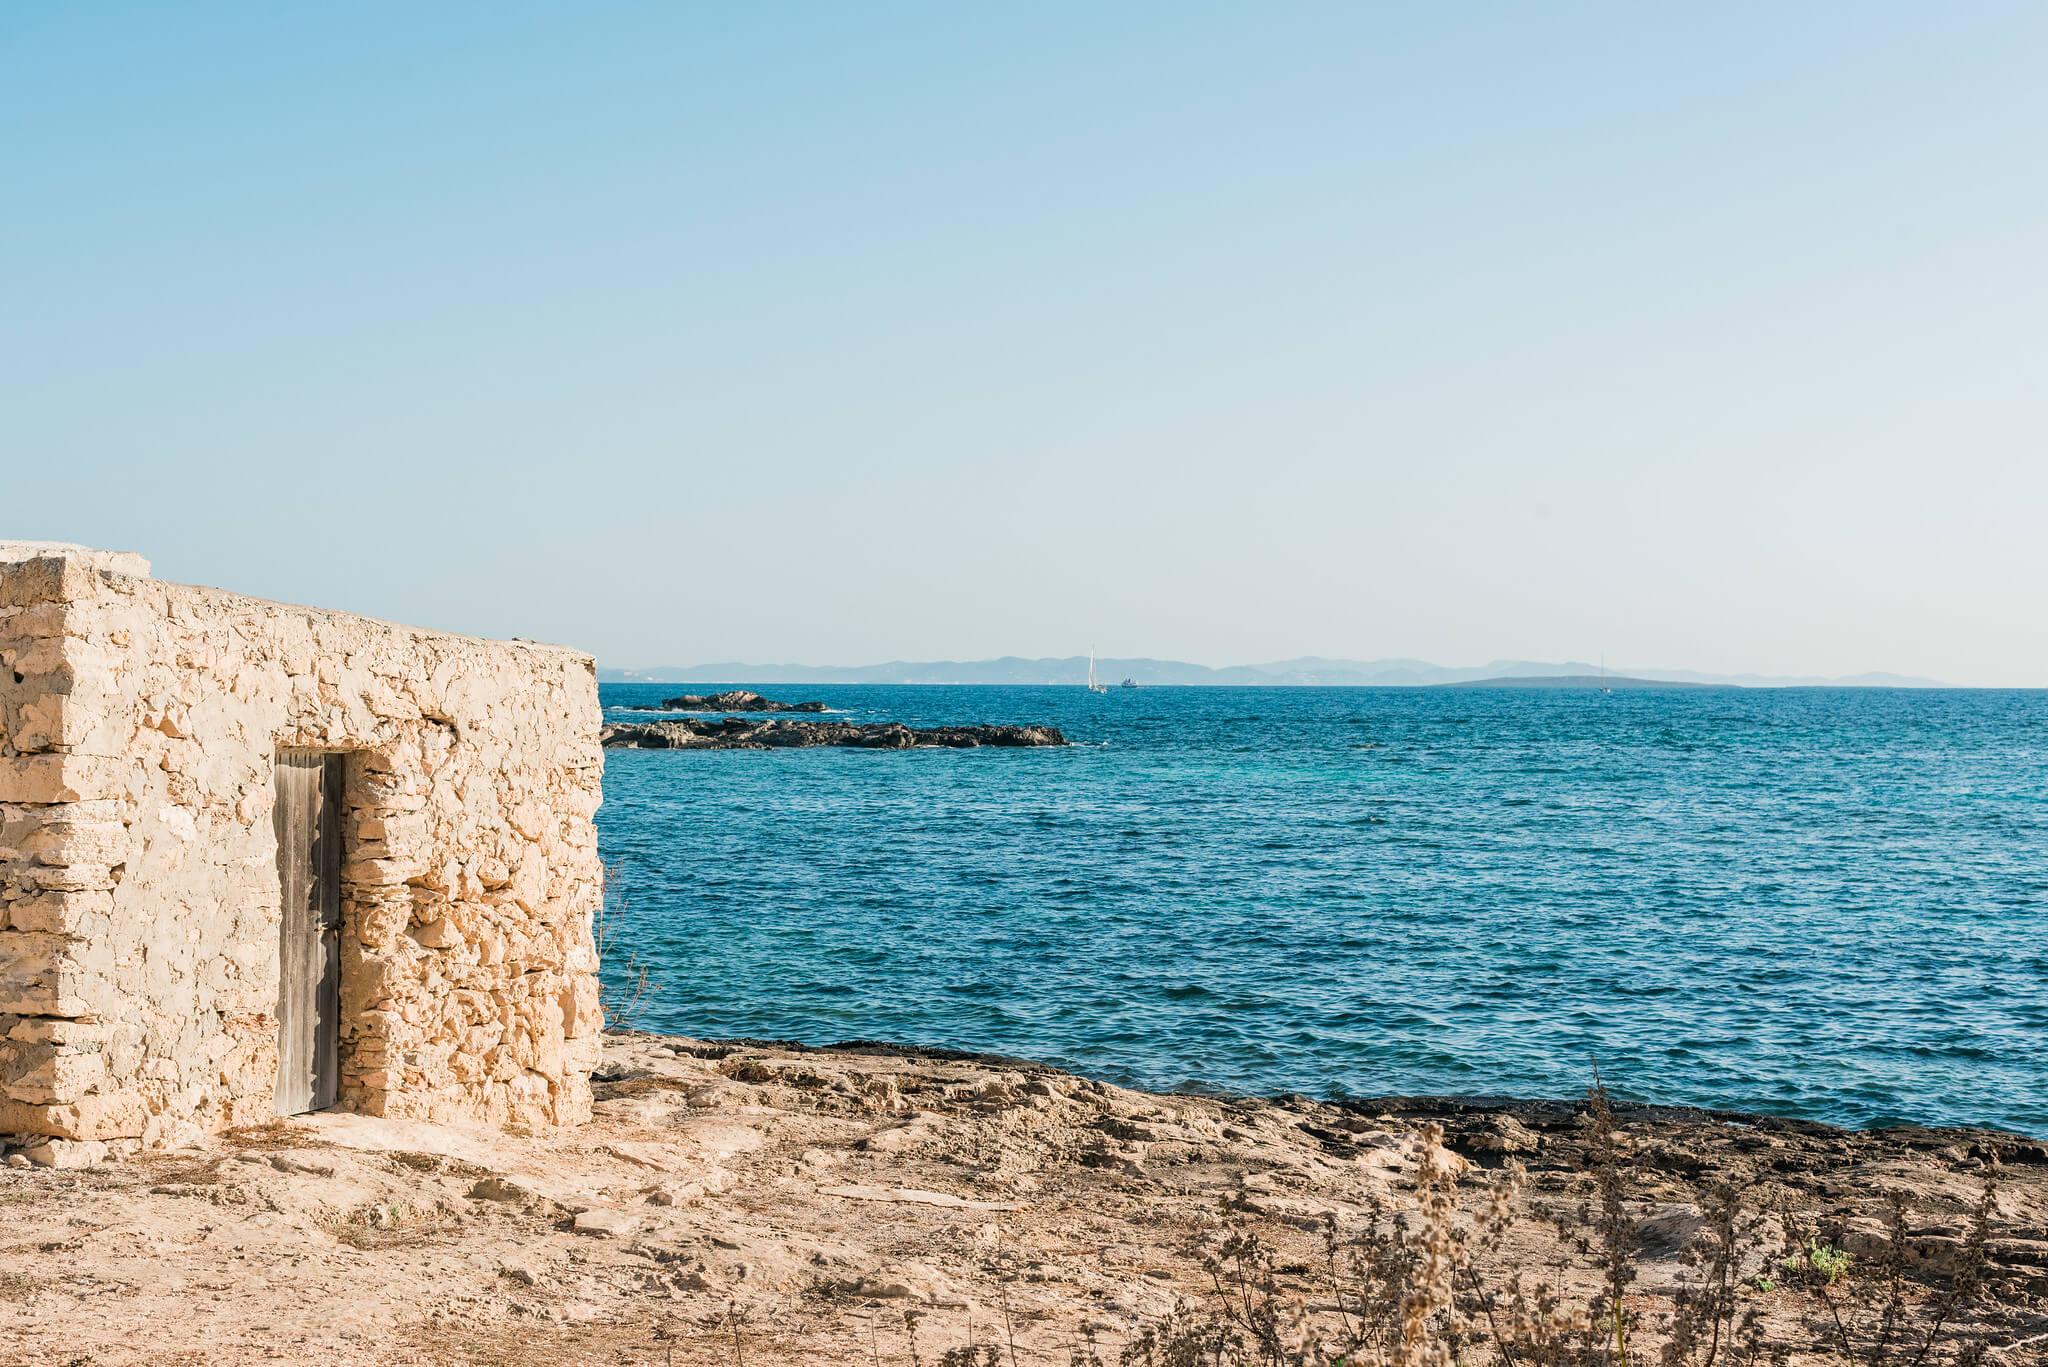 https://www.white-ibiza.com/wp-content/uploads/2020/03/formentera-beaches-es-pujols-2020-02.jpg